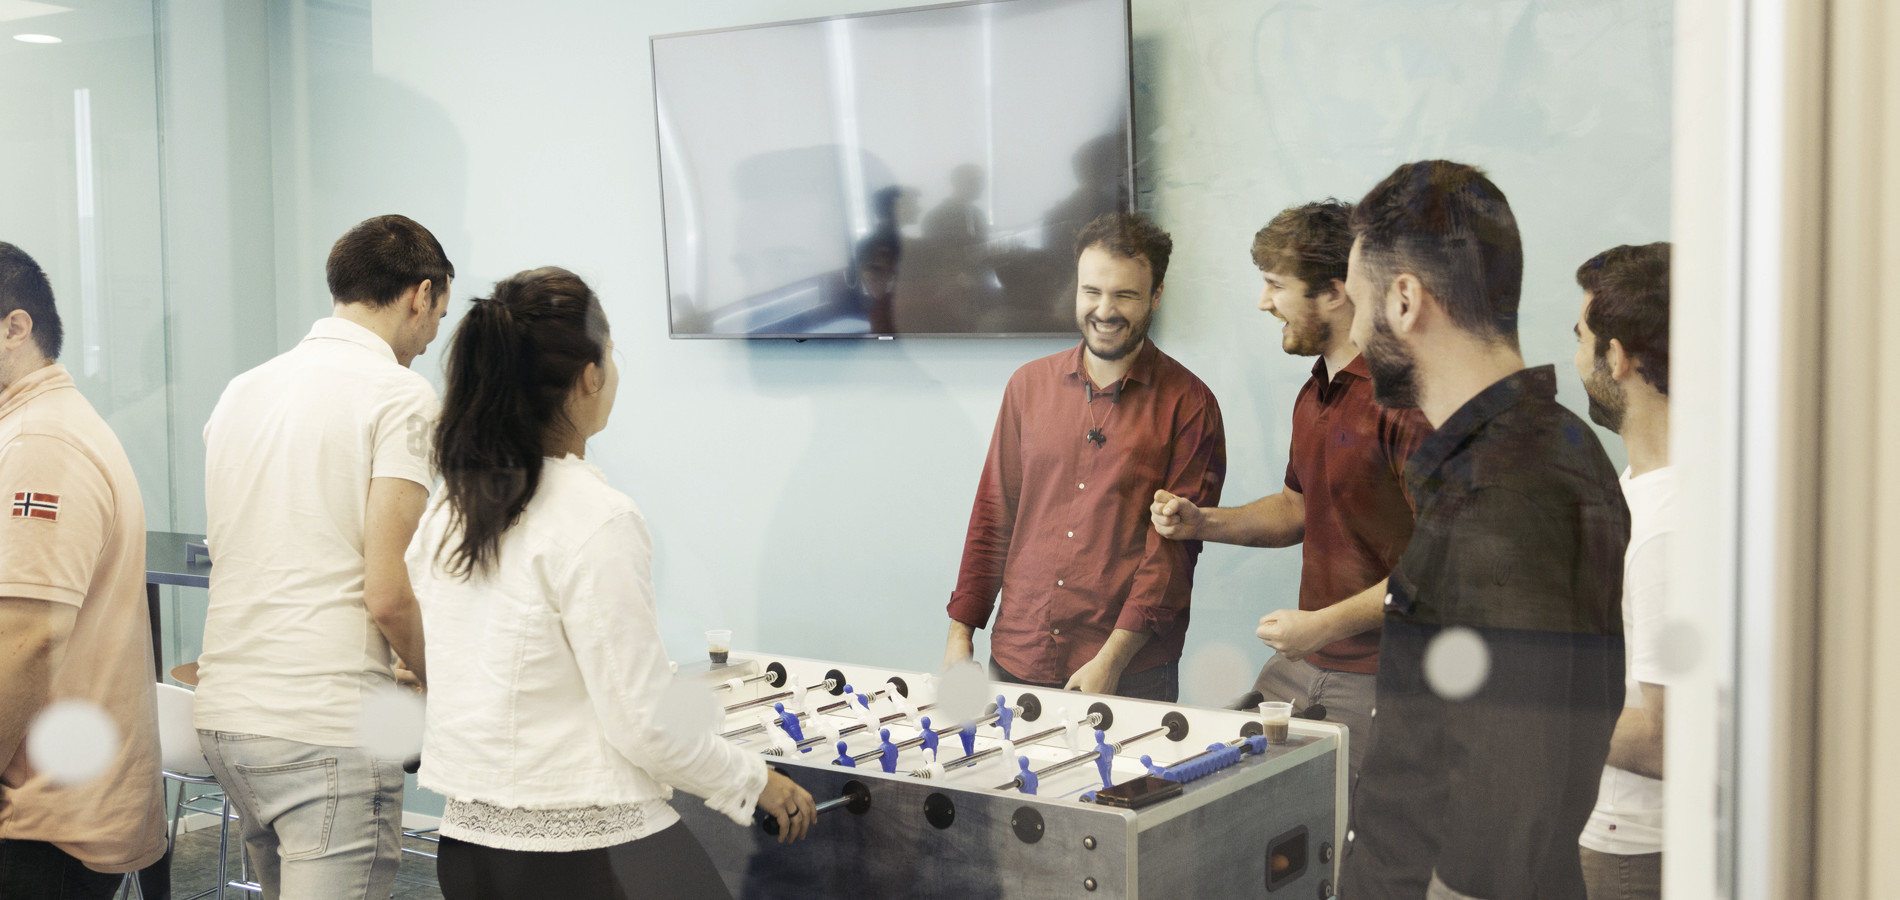 Atlantic team playing table football